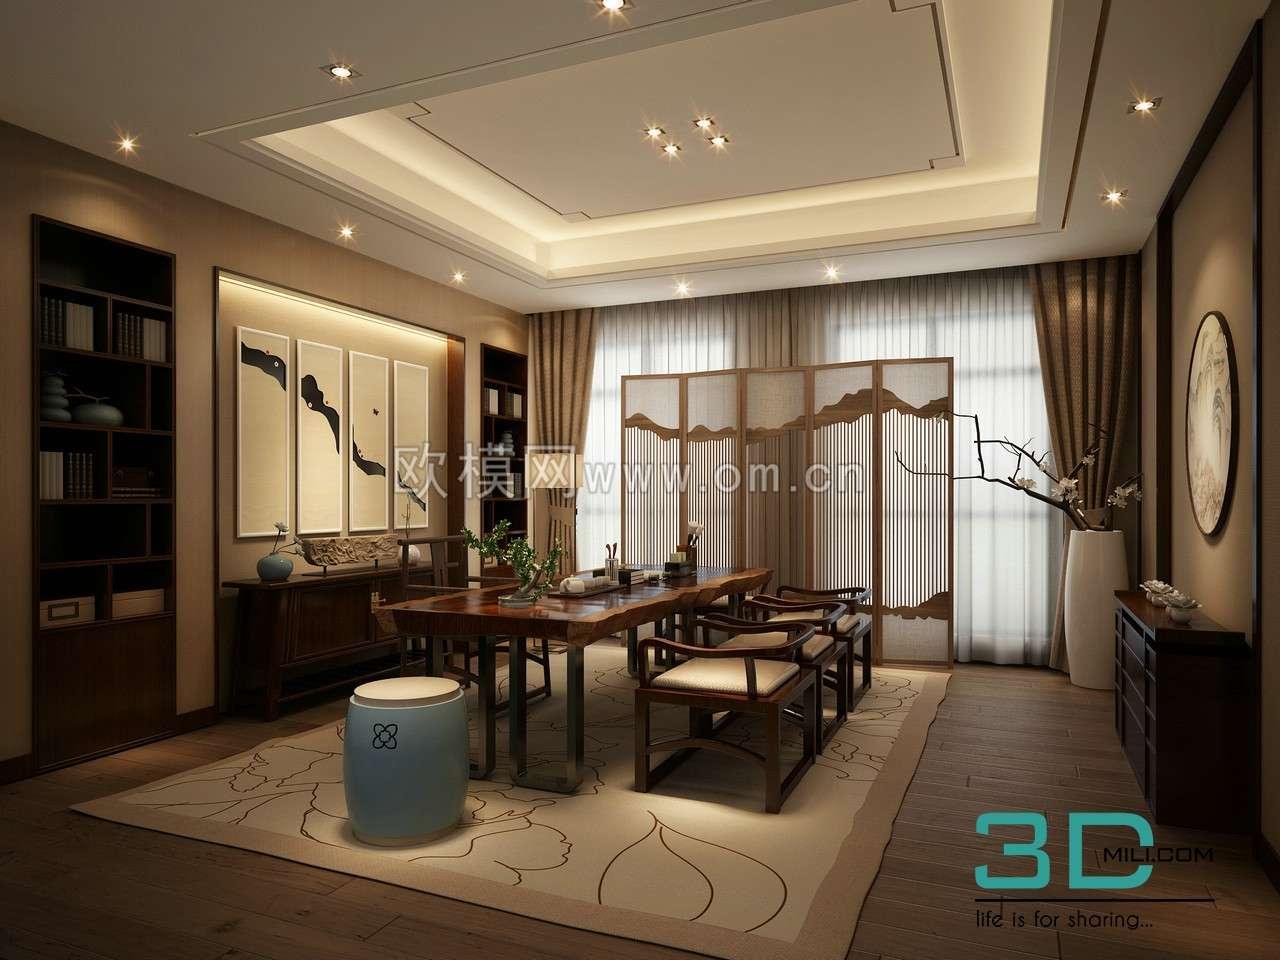 kitchen room 3dmax free download 3d mili download 3d model